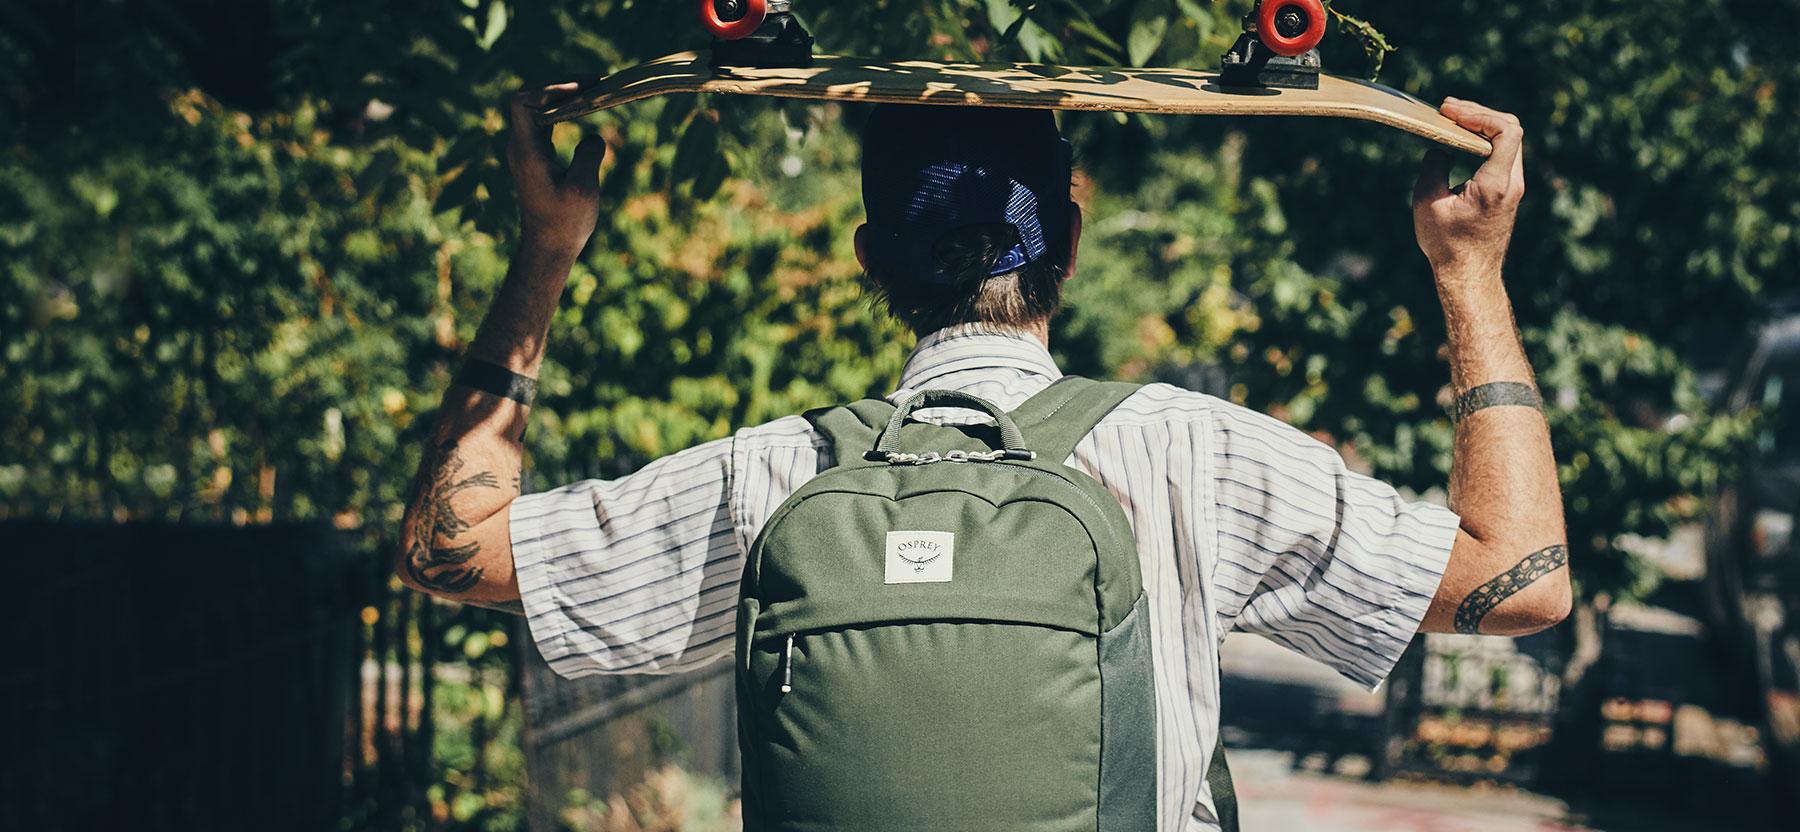 arcane-daypack-lifestyle-2_1.jpg